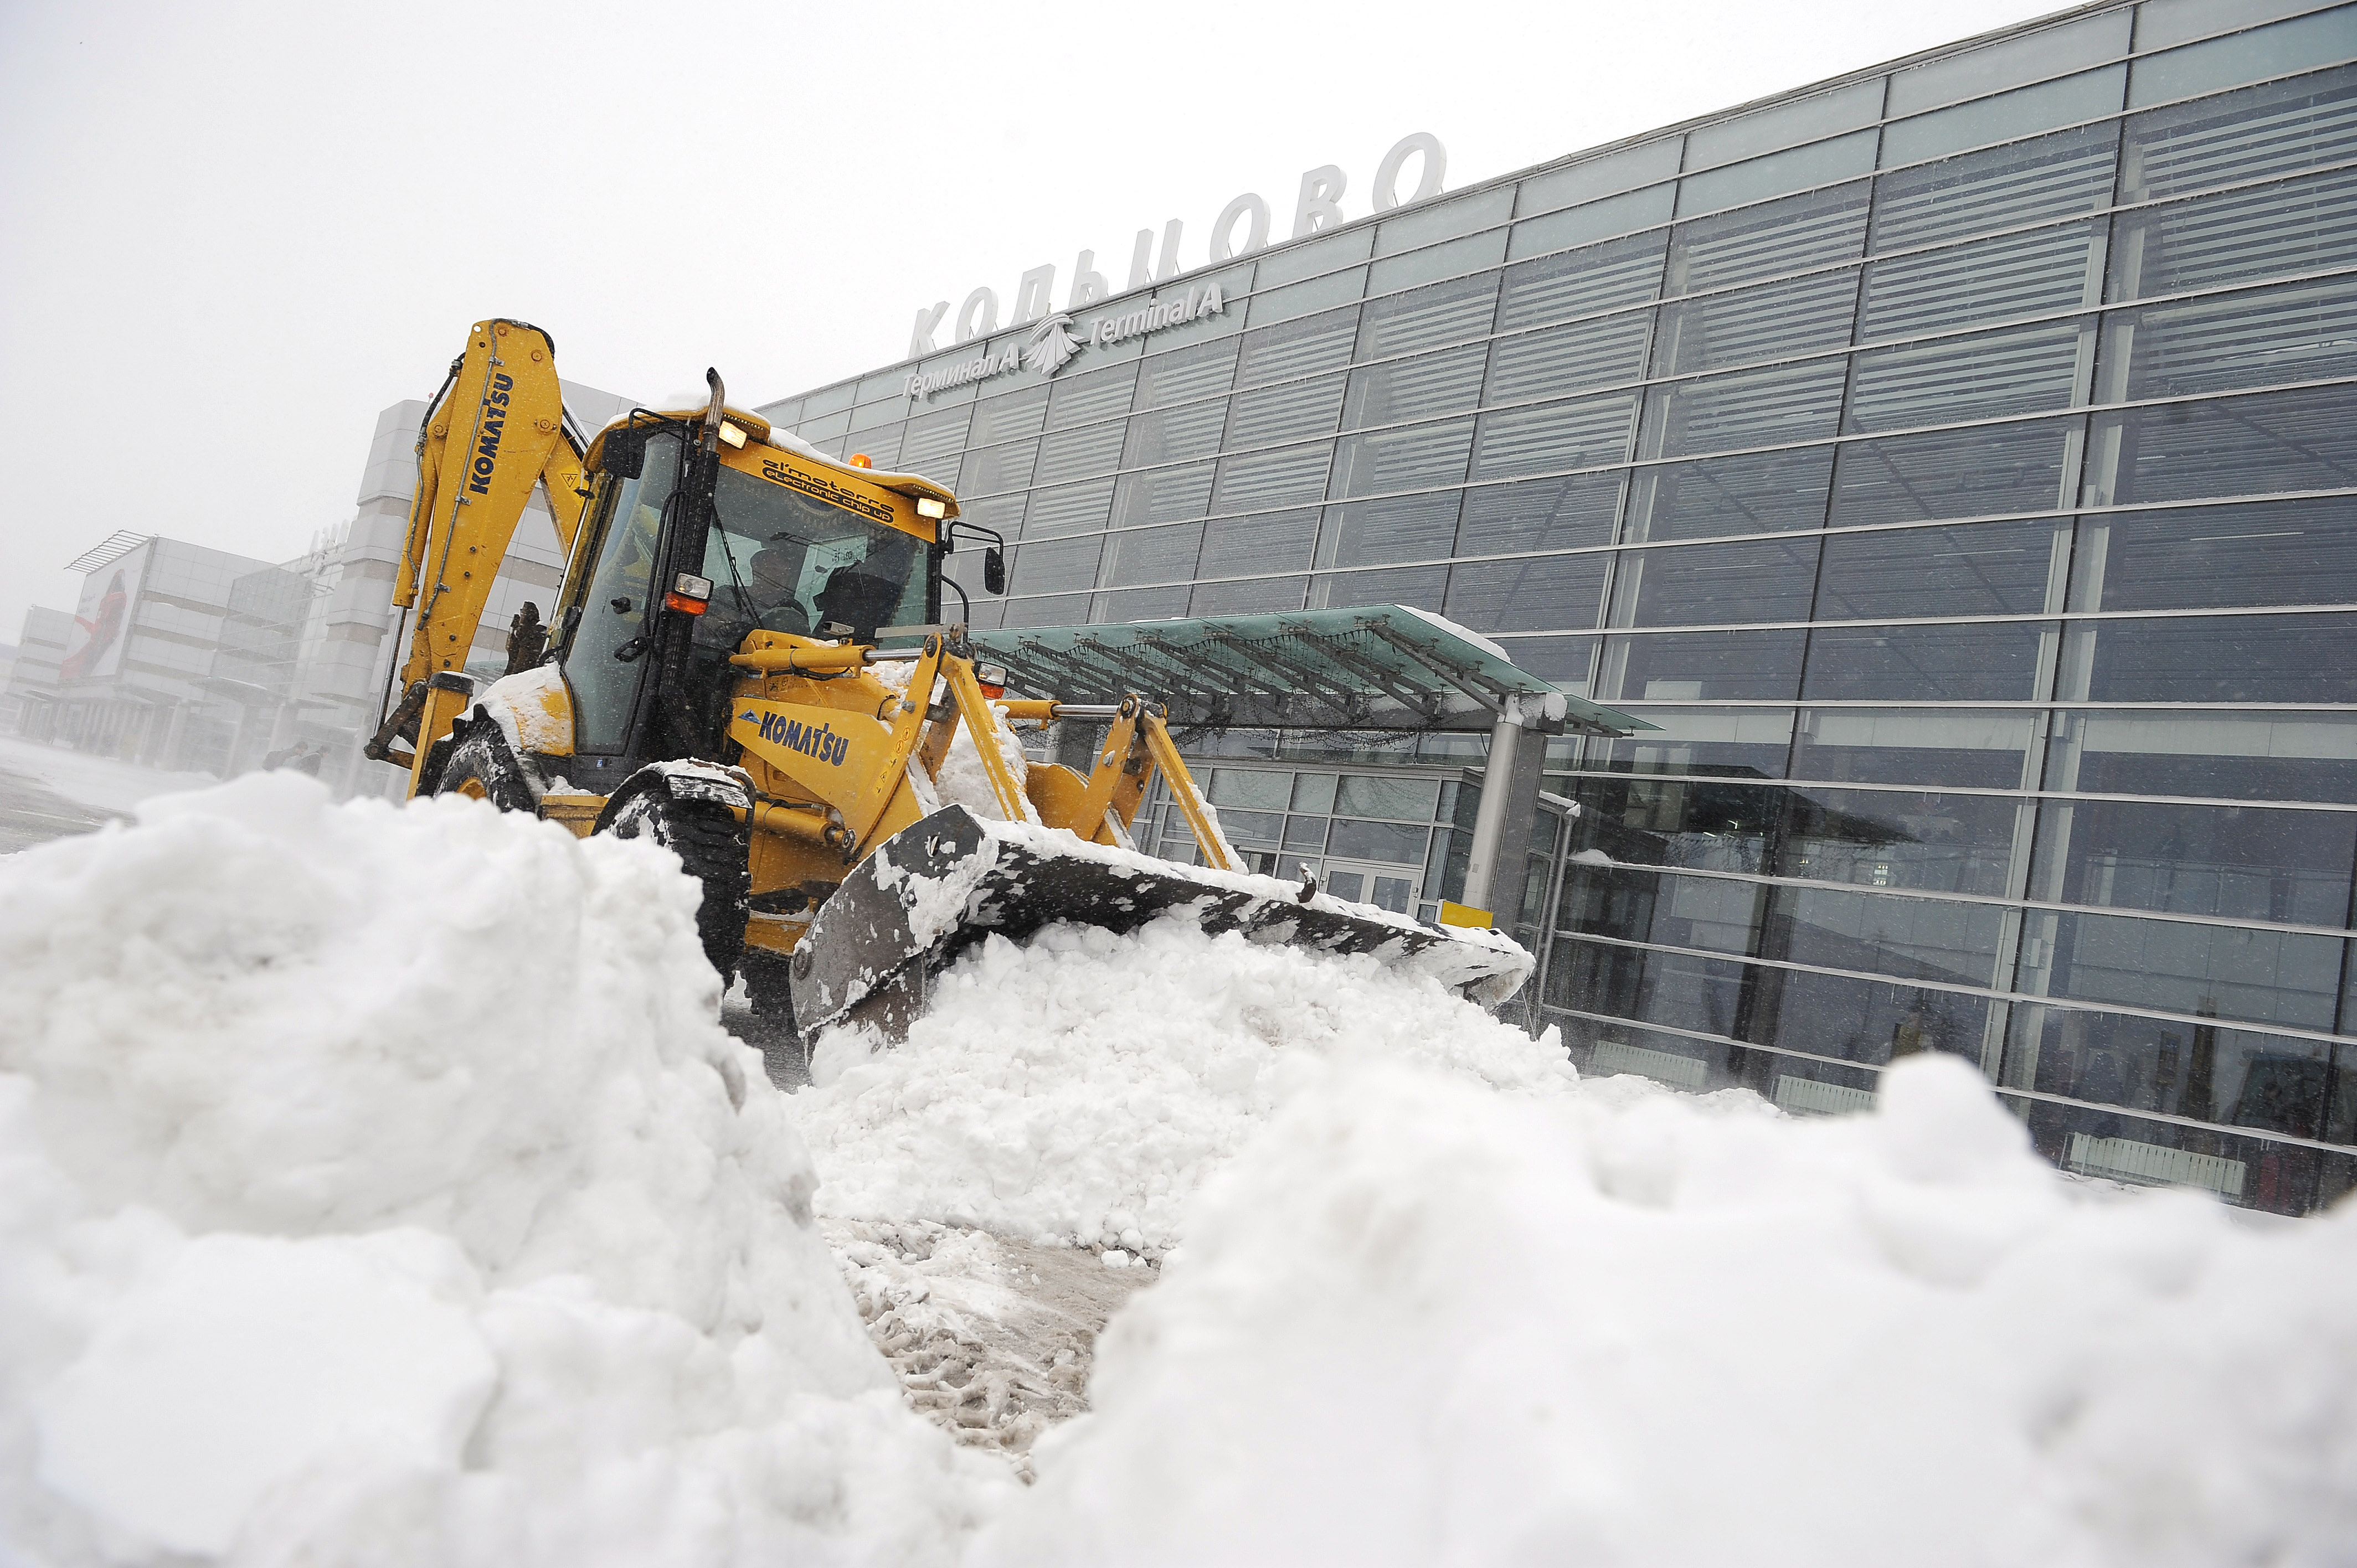 Уборка снега в аэропорту Екатеринбурга